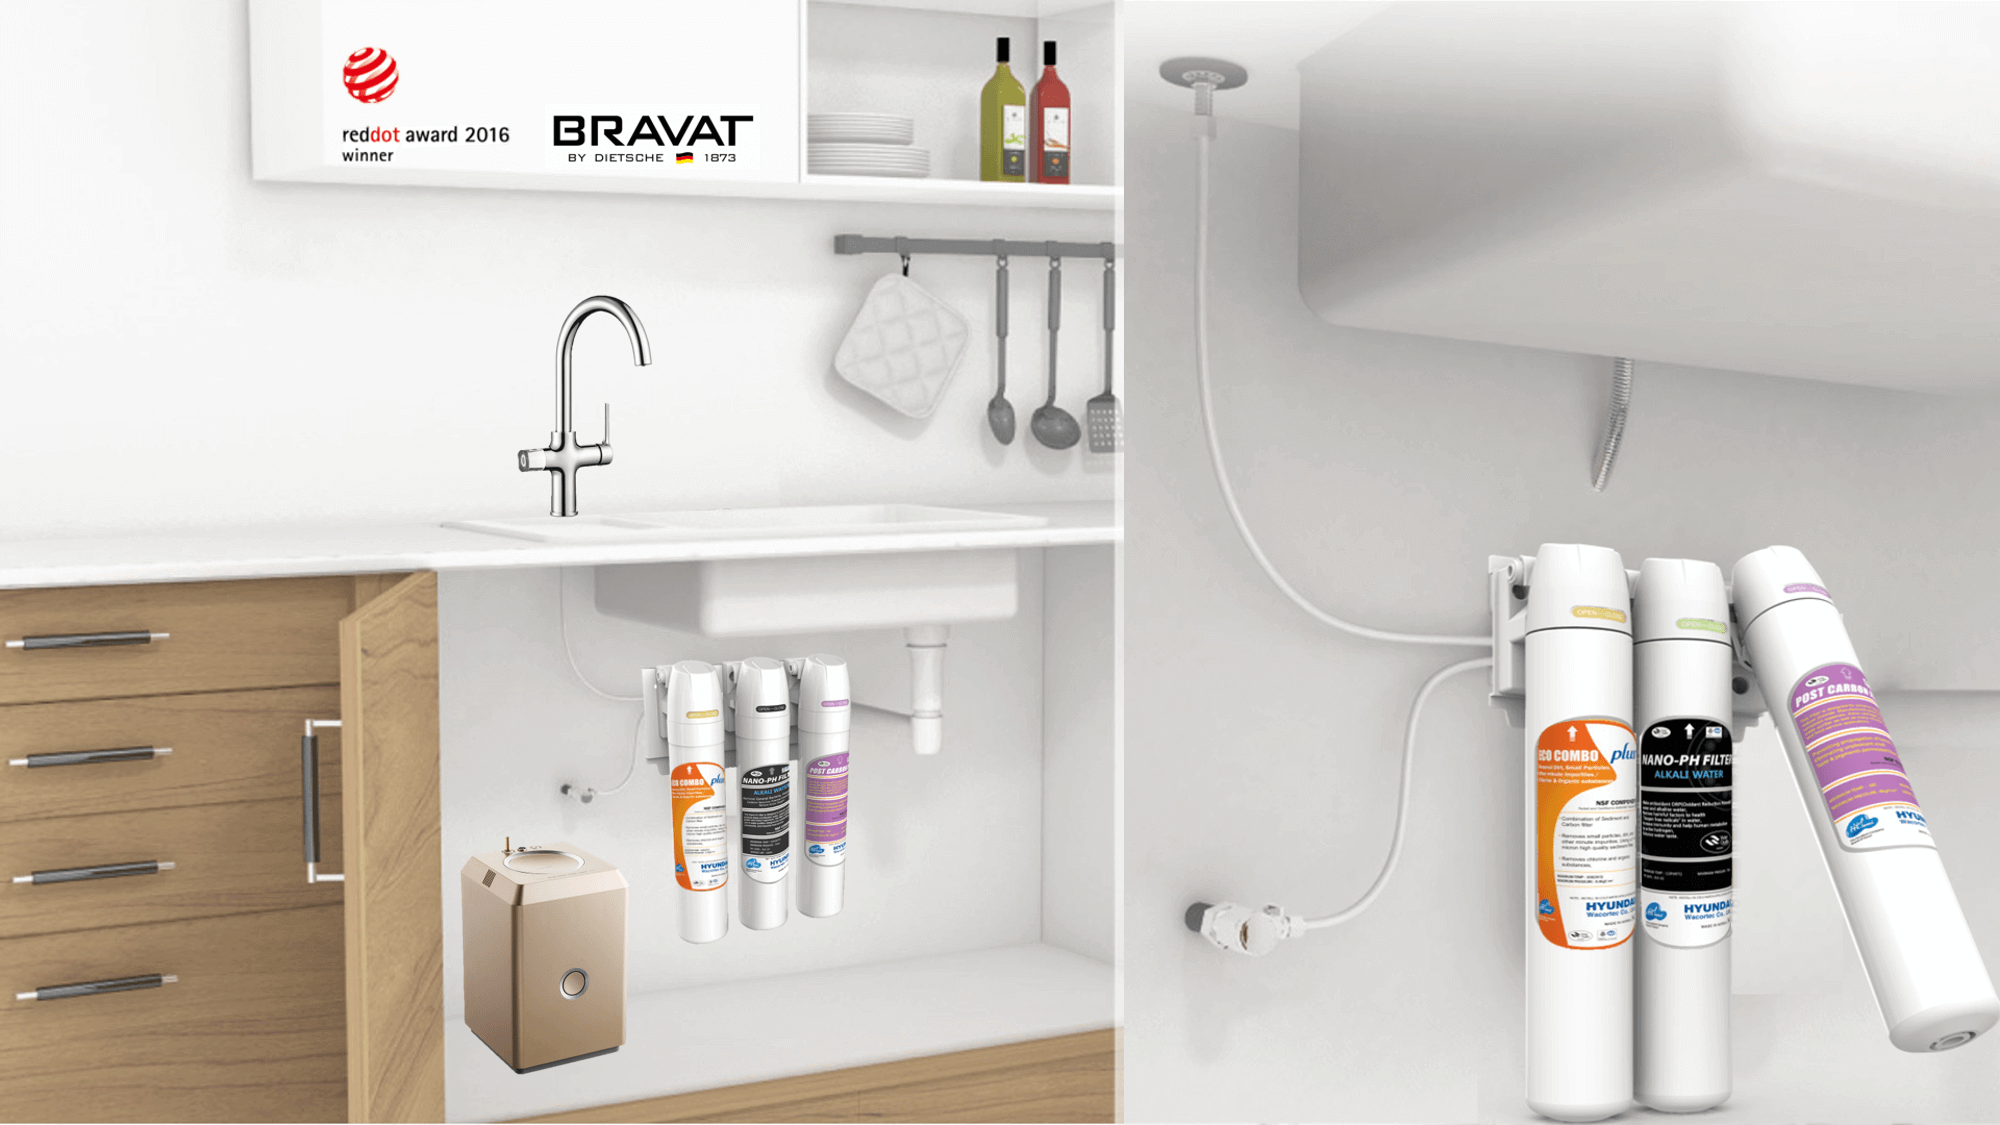 Bravat Equatre with 3 Stage Filter Installation